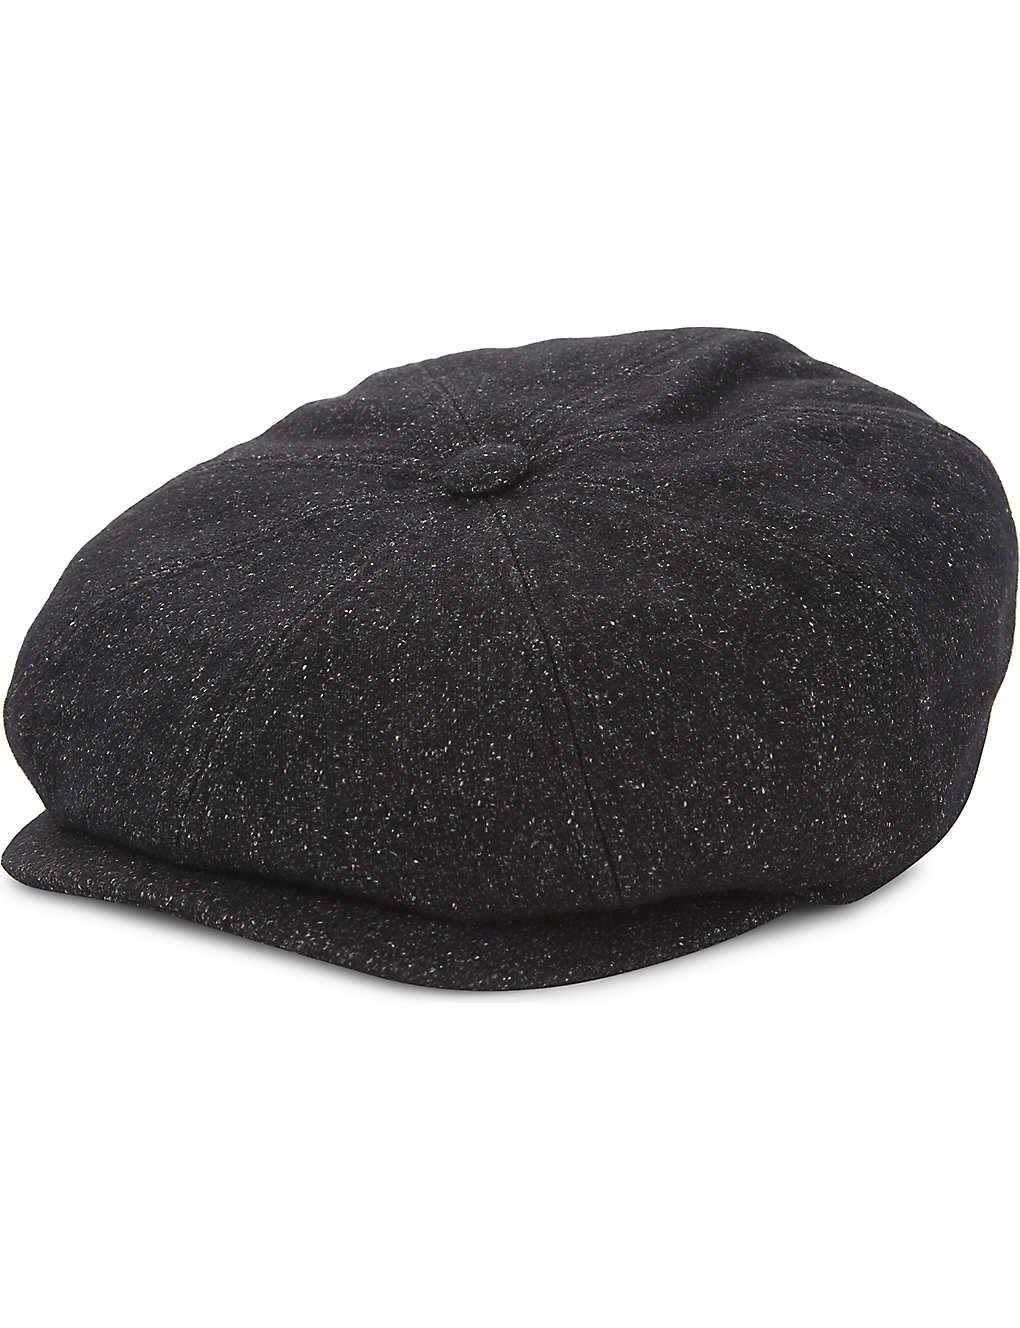 TED BAKER - Baker boy wool-blend cap  3451603ed06